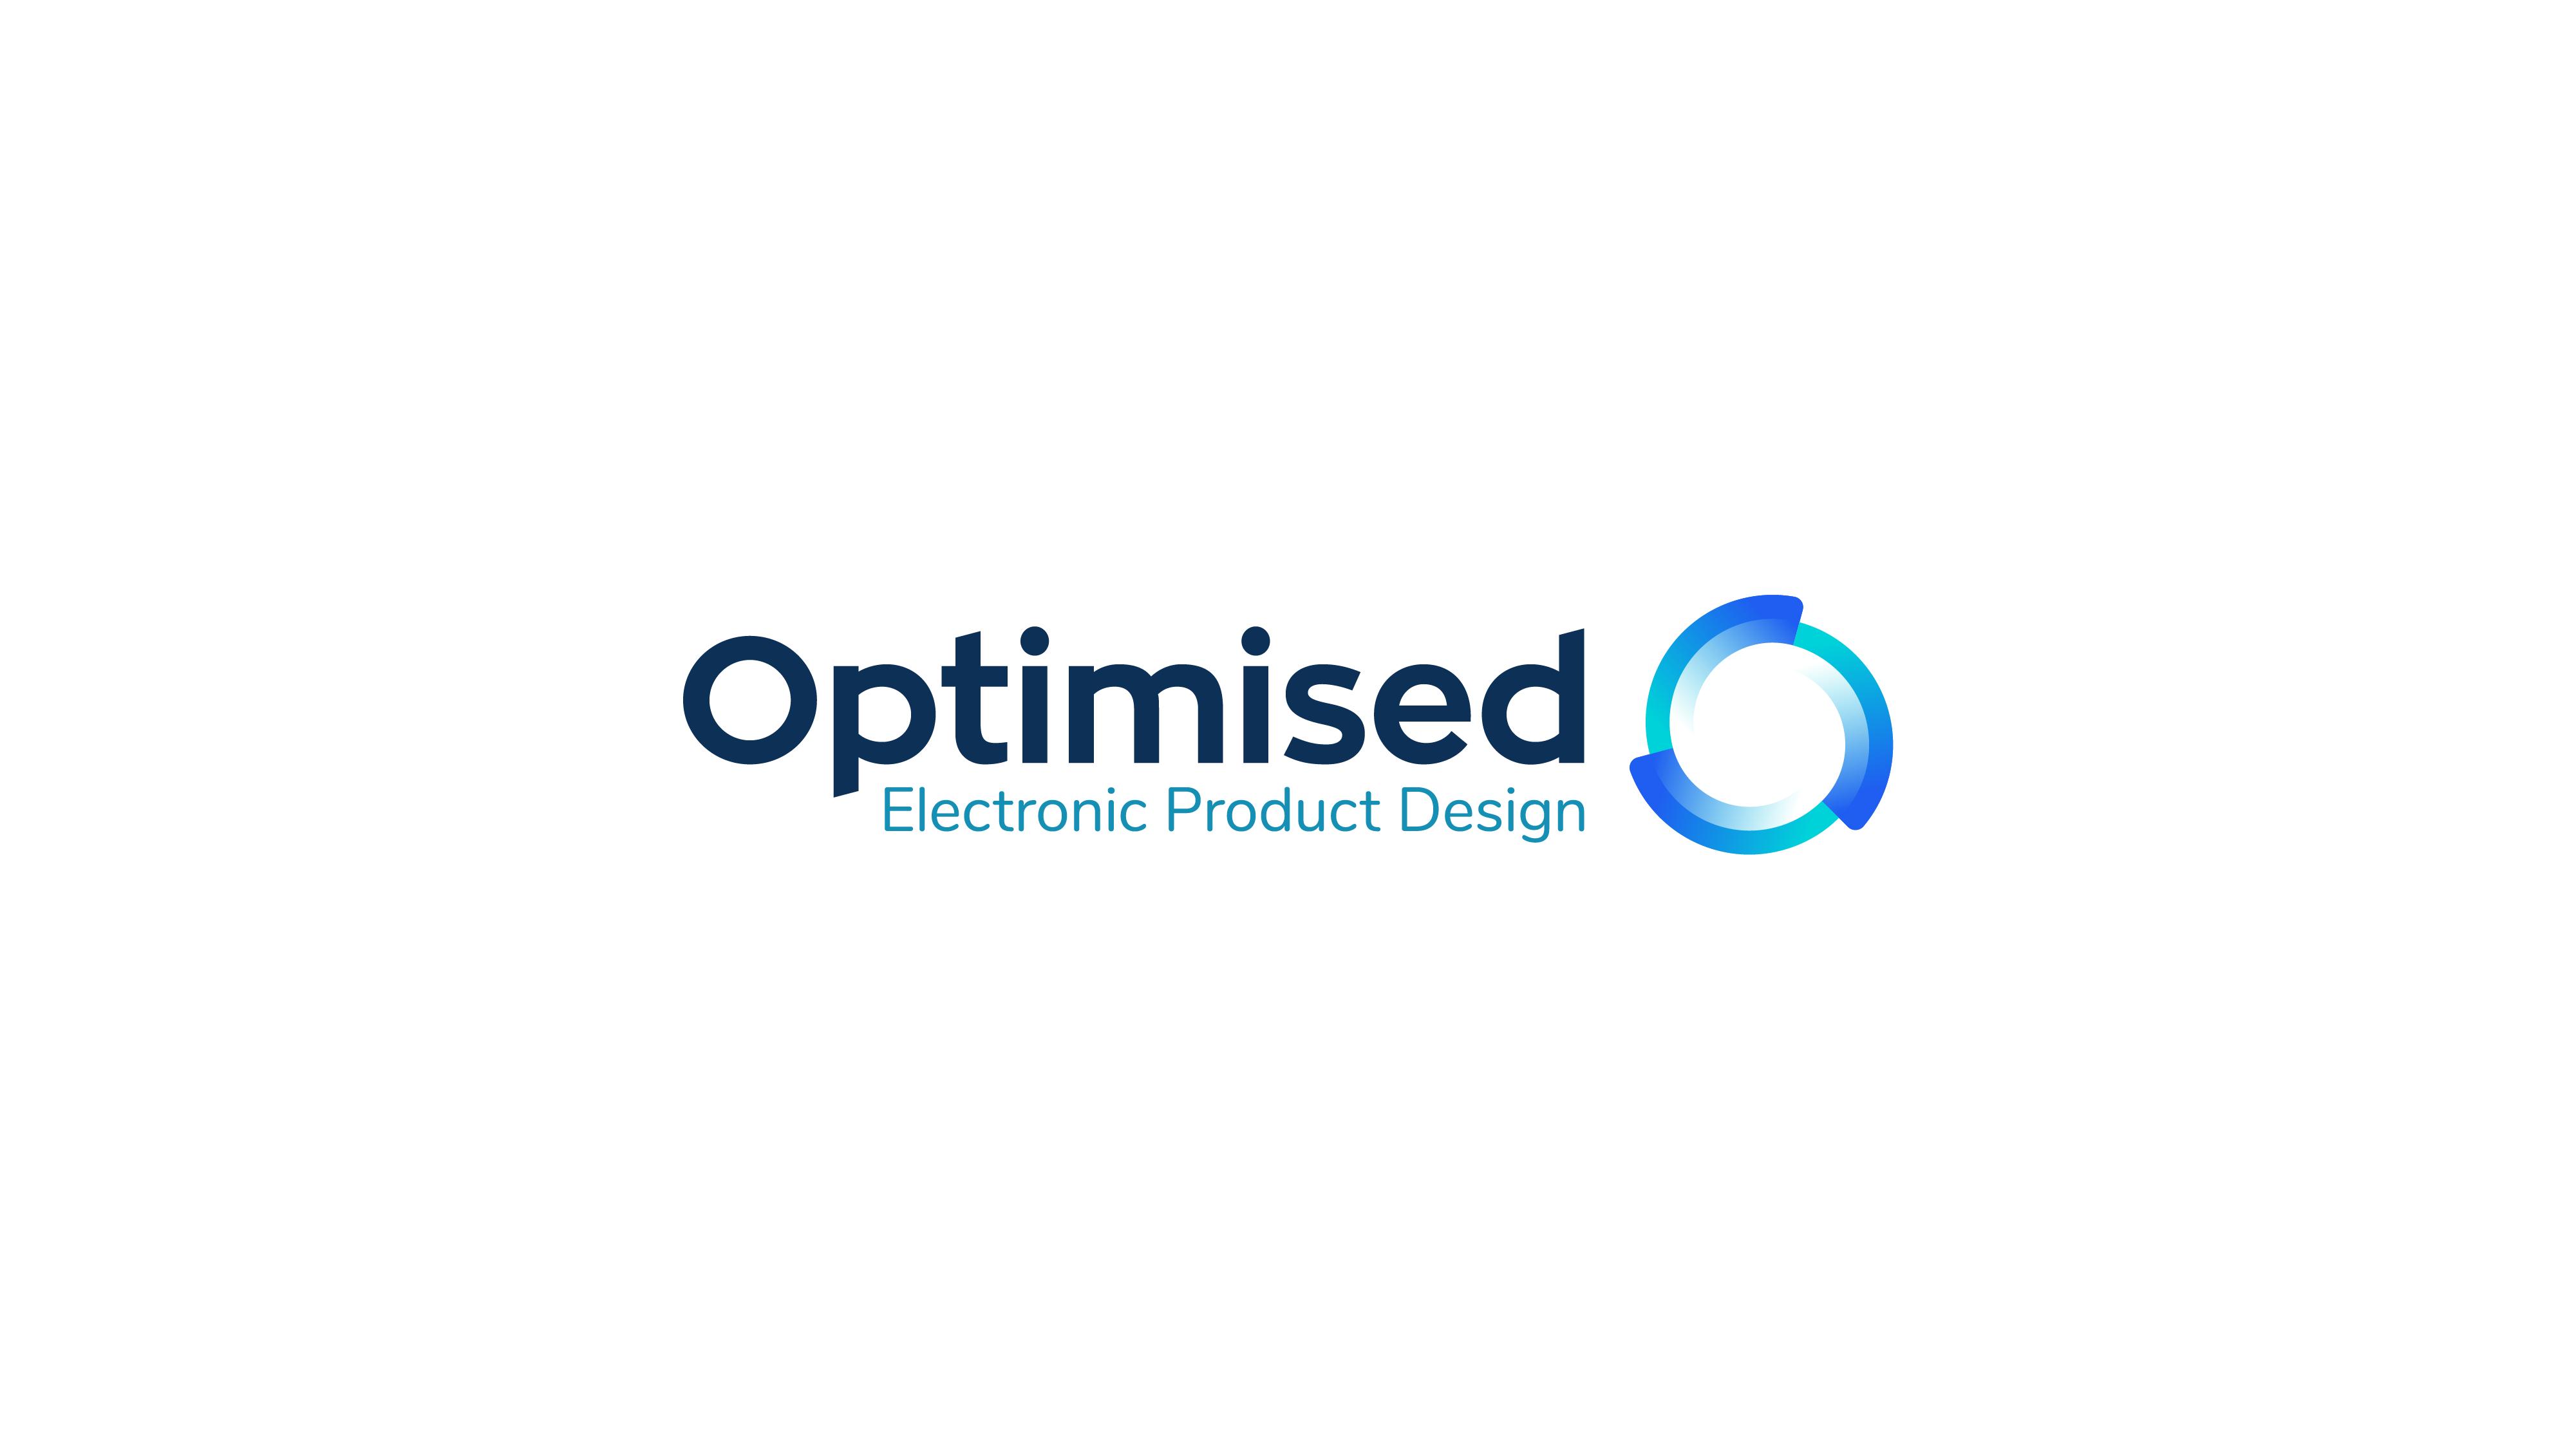 dynamic motion logo that displays letter O